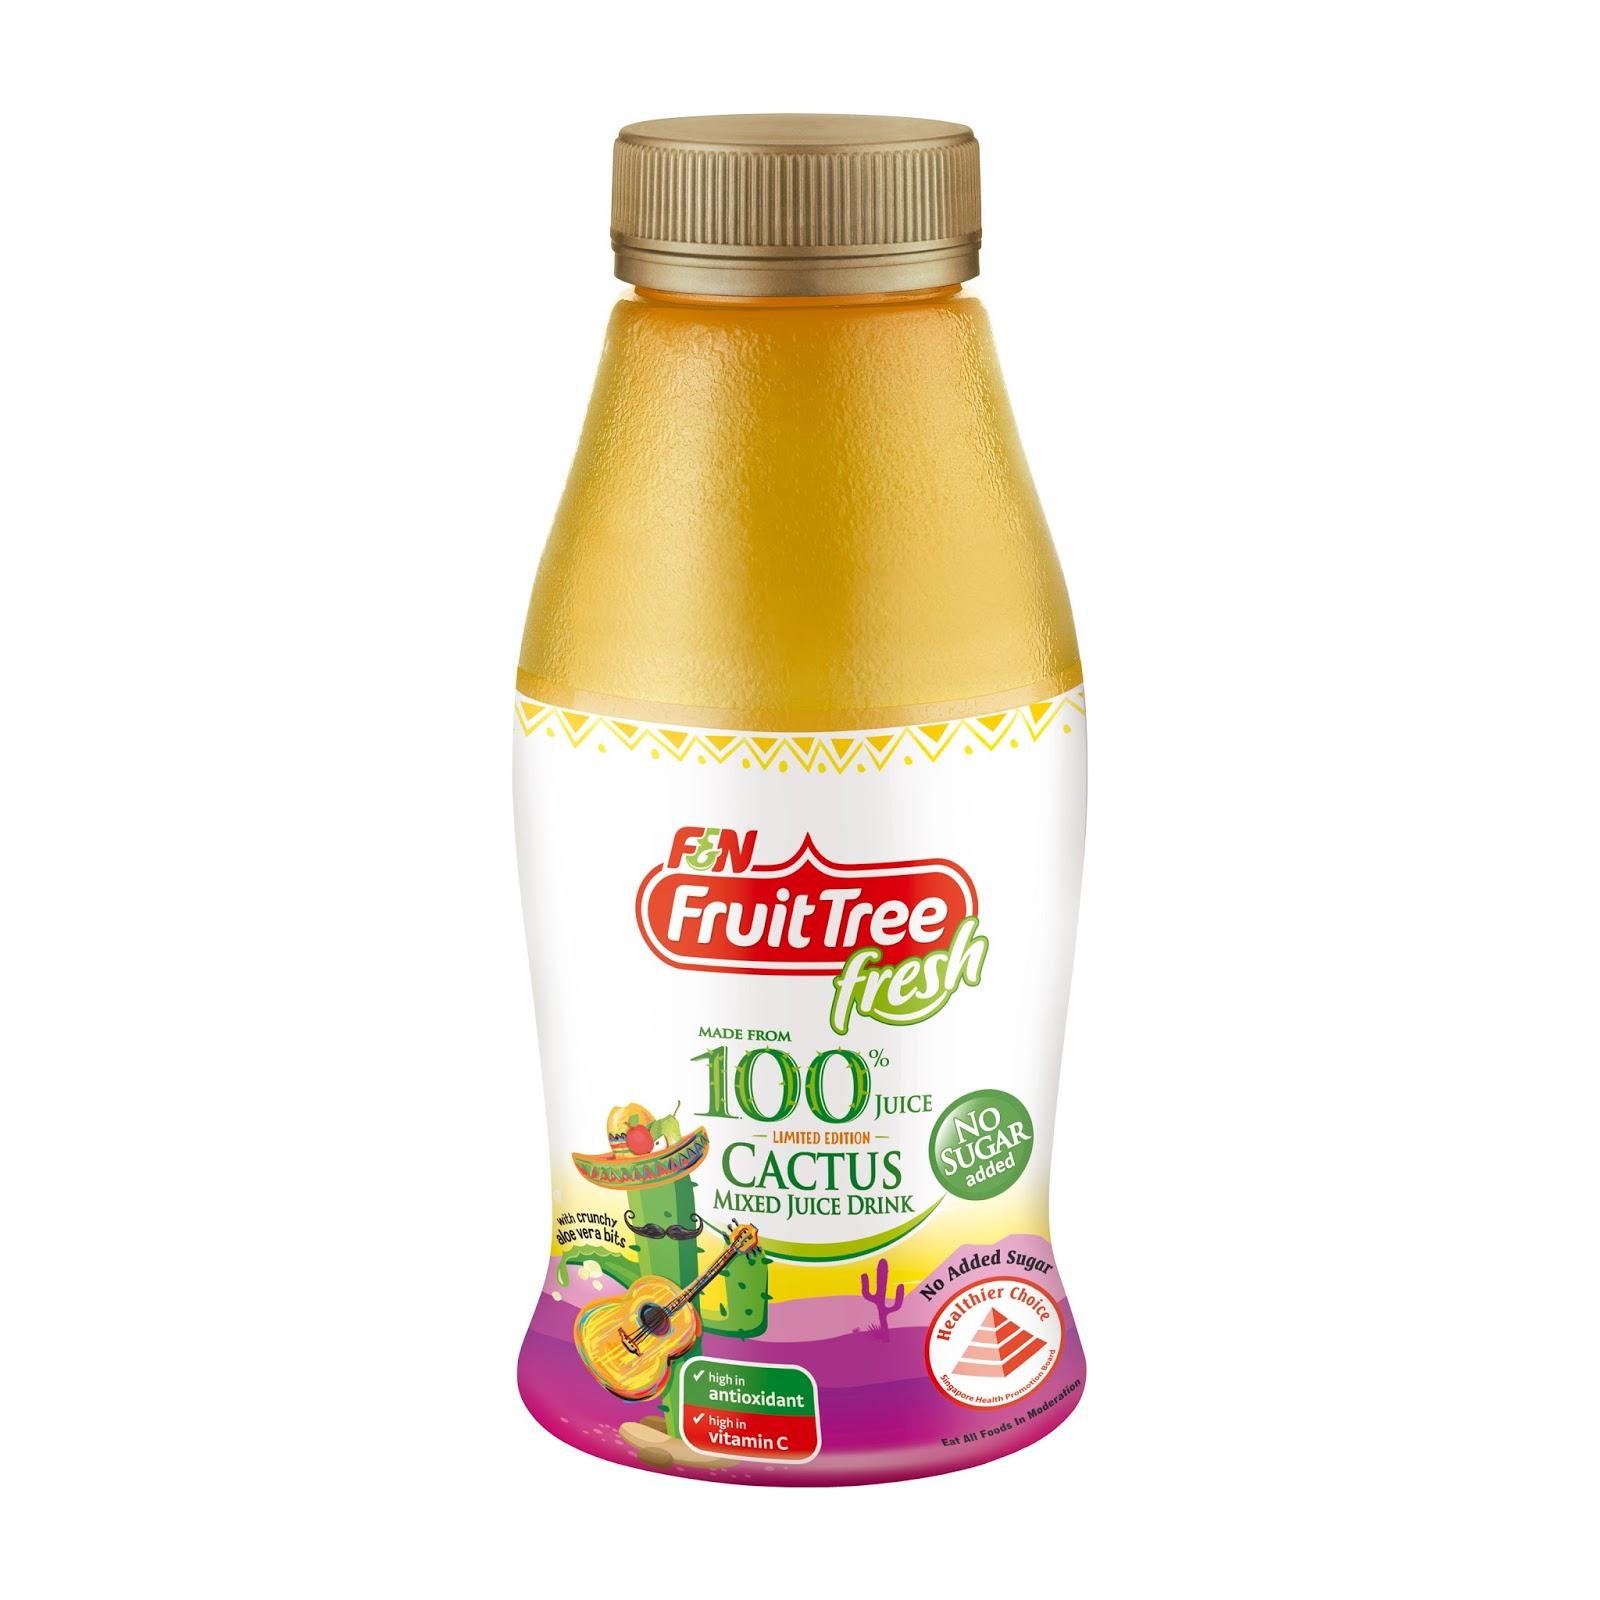 meryl limited edition f n fruit tree fresh cactus mixed juice drink